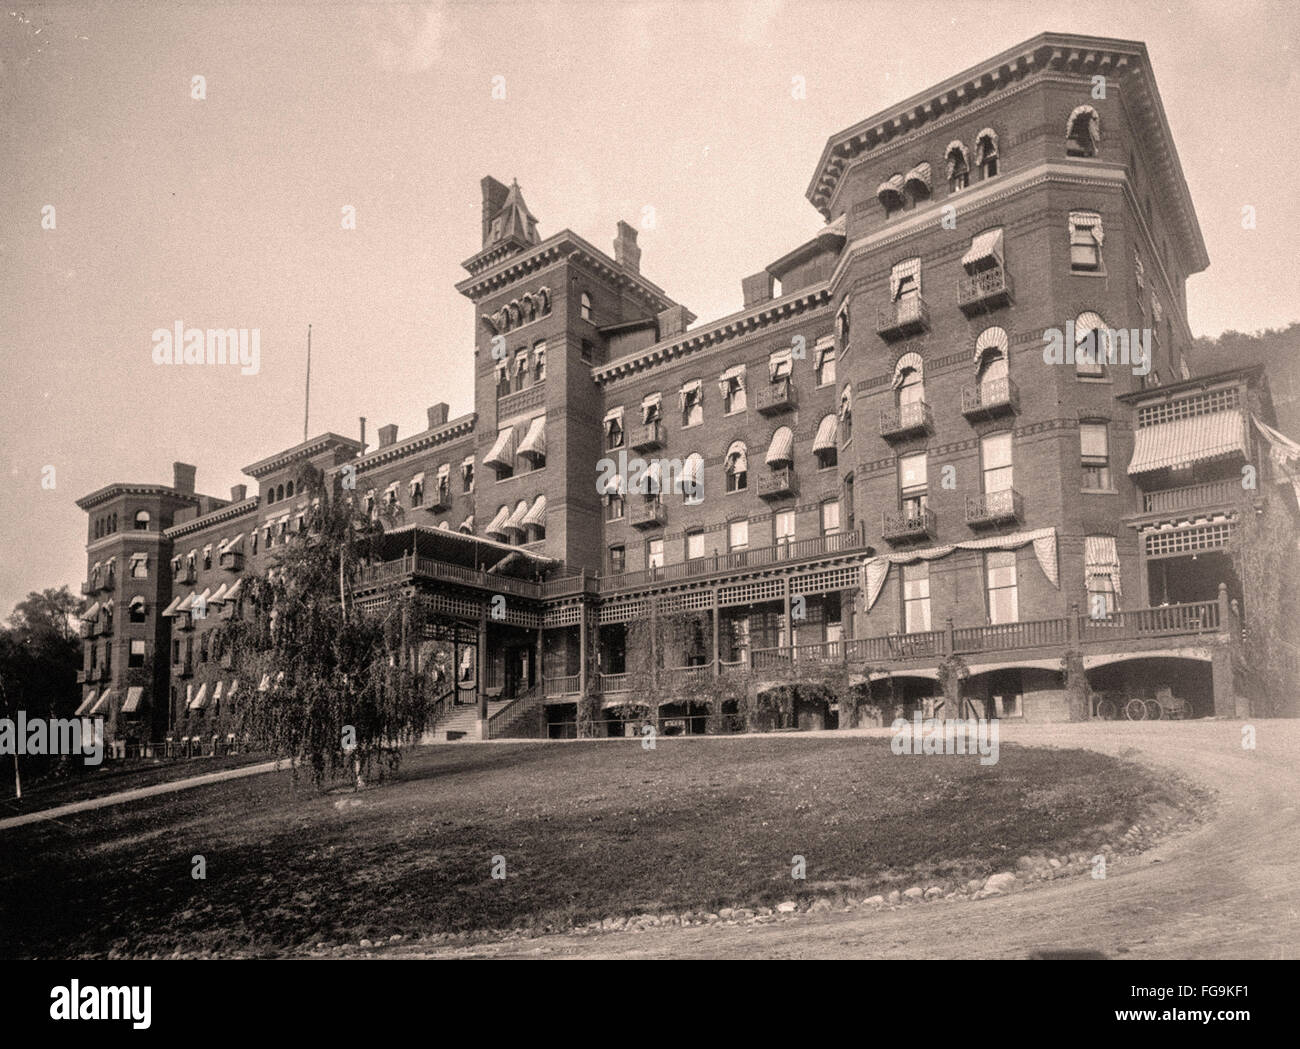 Rues de New York à la fin du 19e siècle Photo Stock